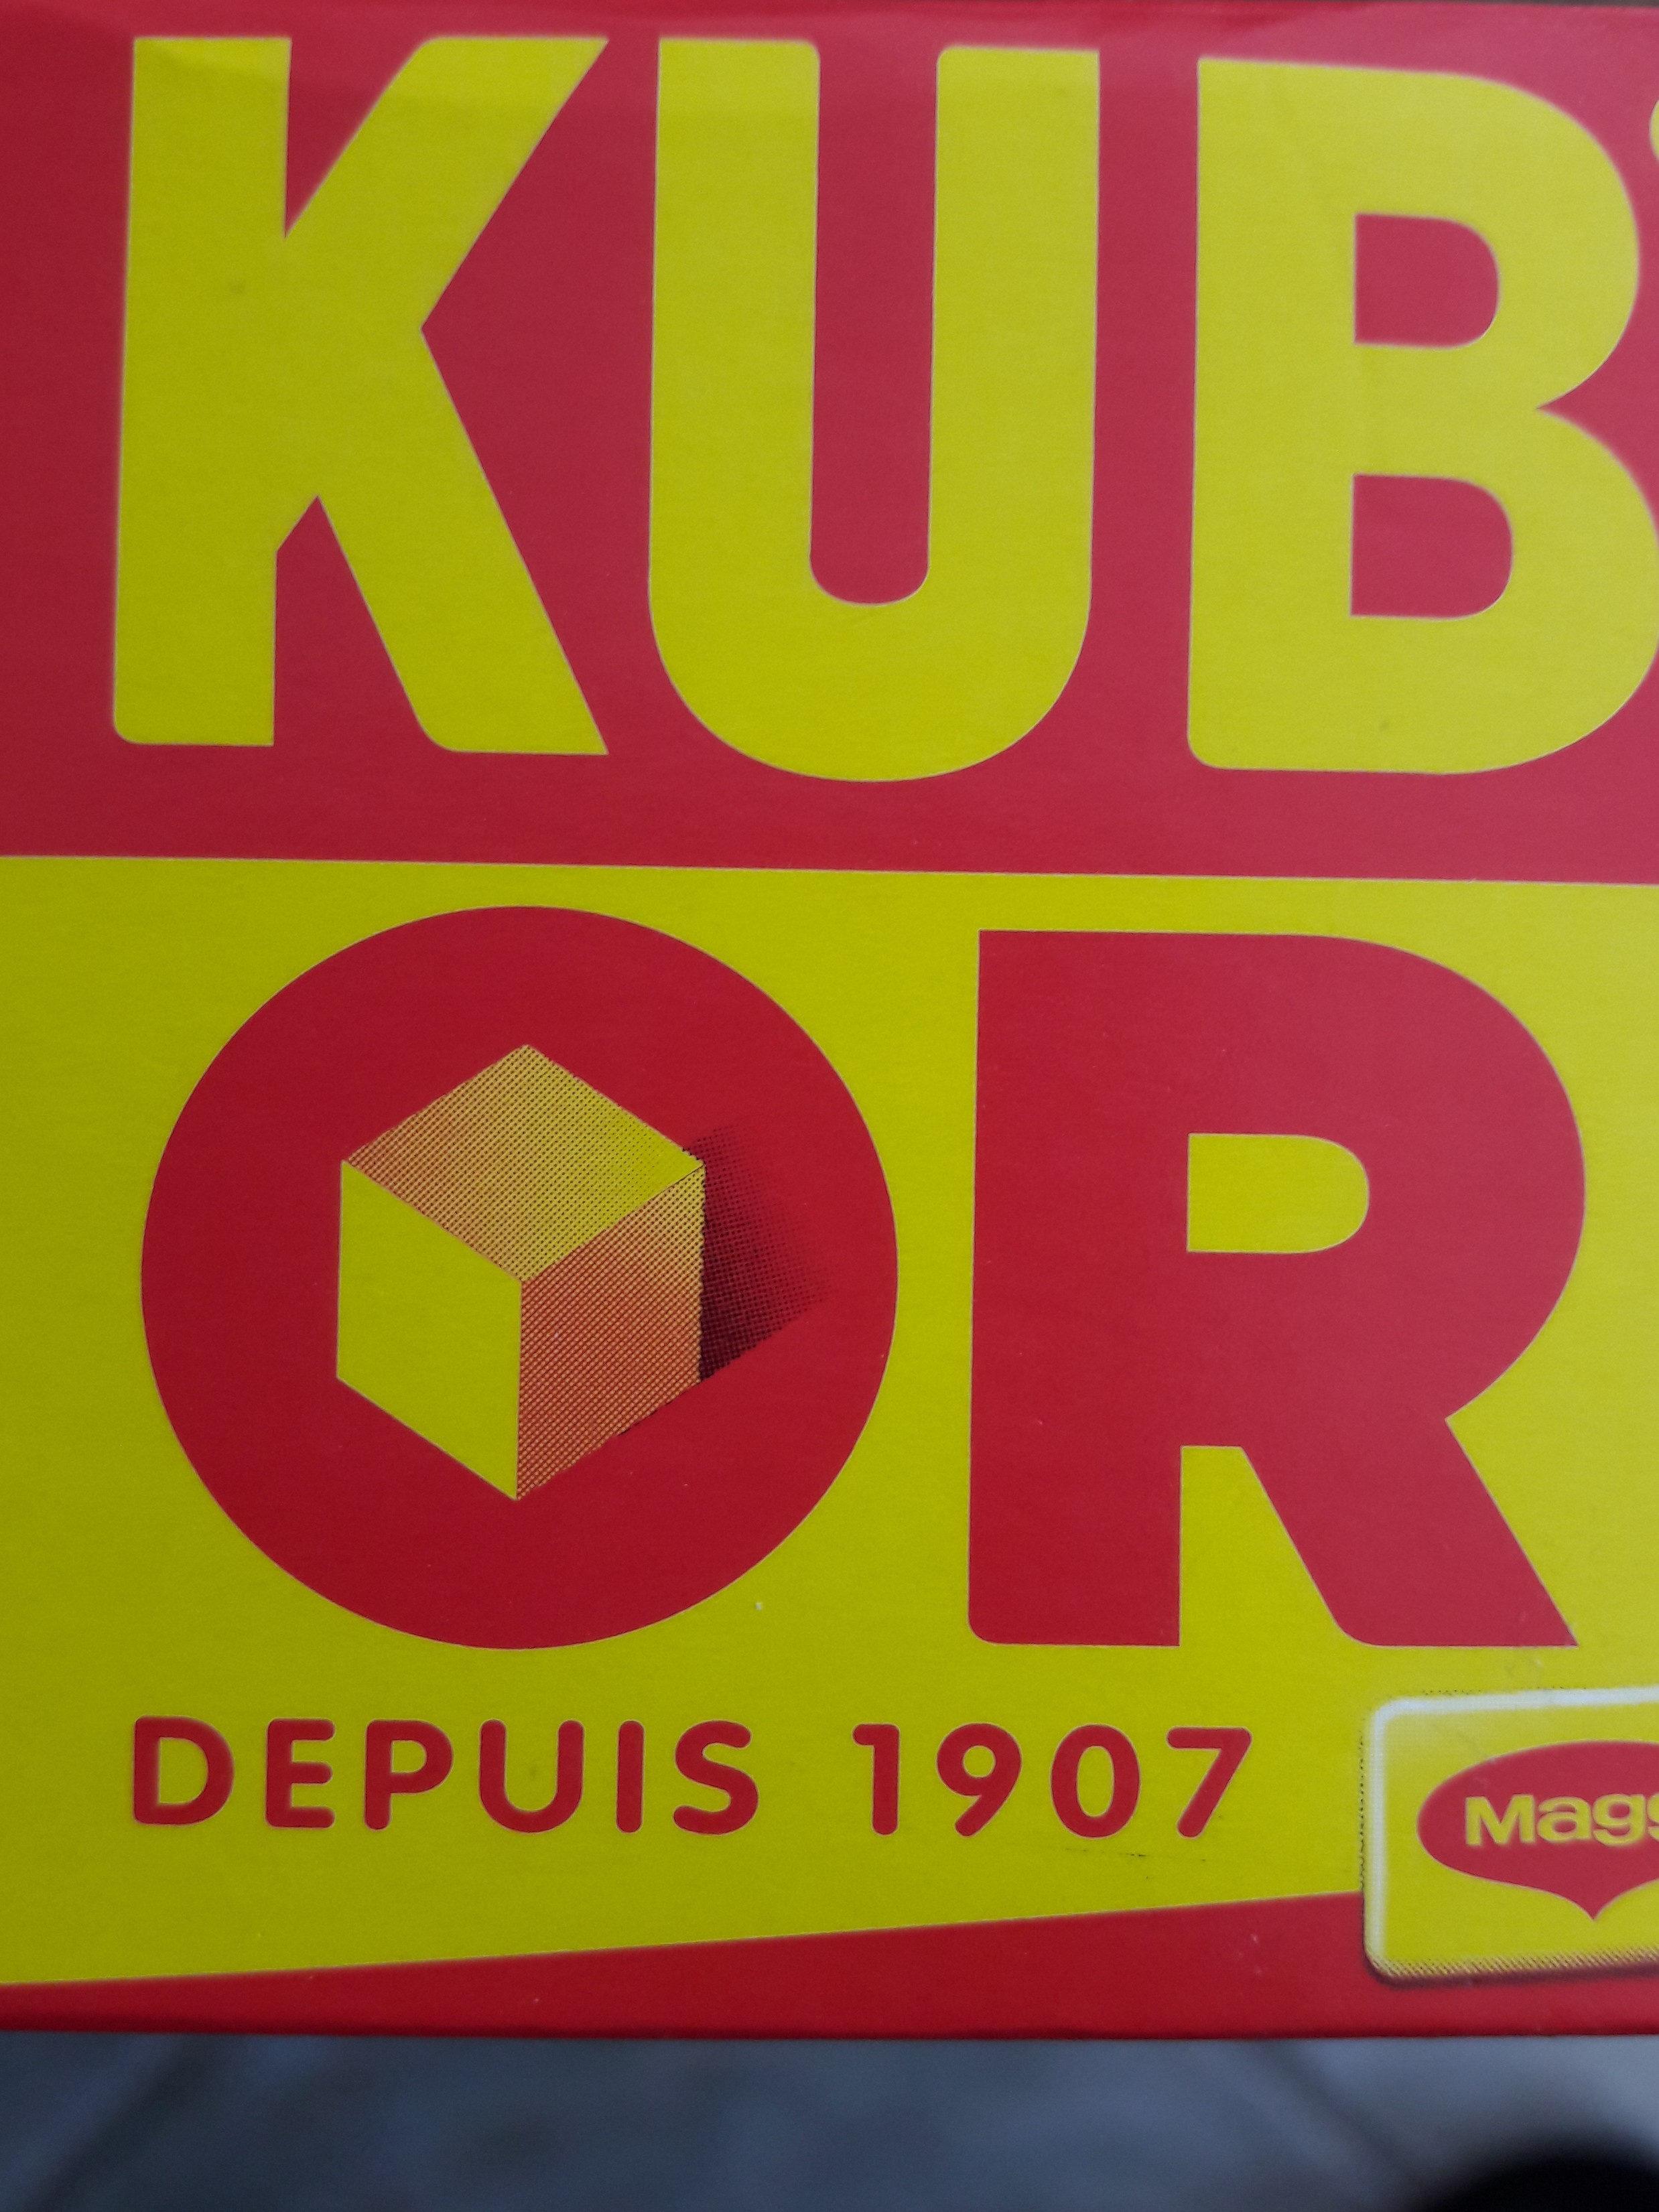 kub  or maggi - Product